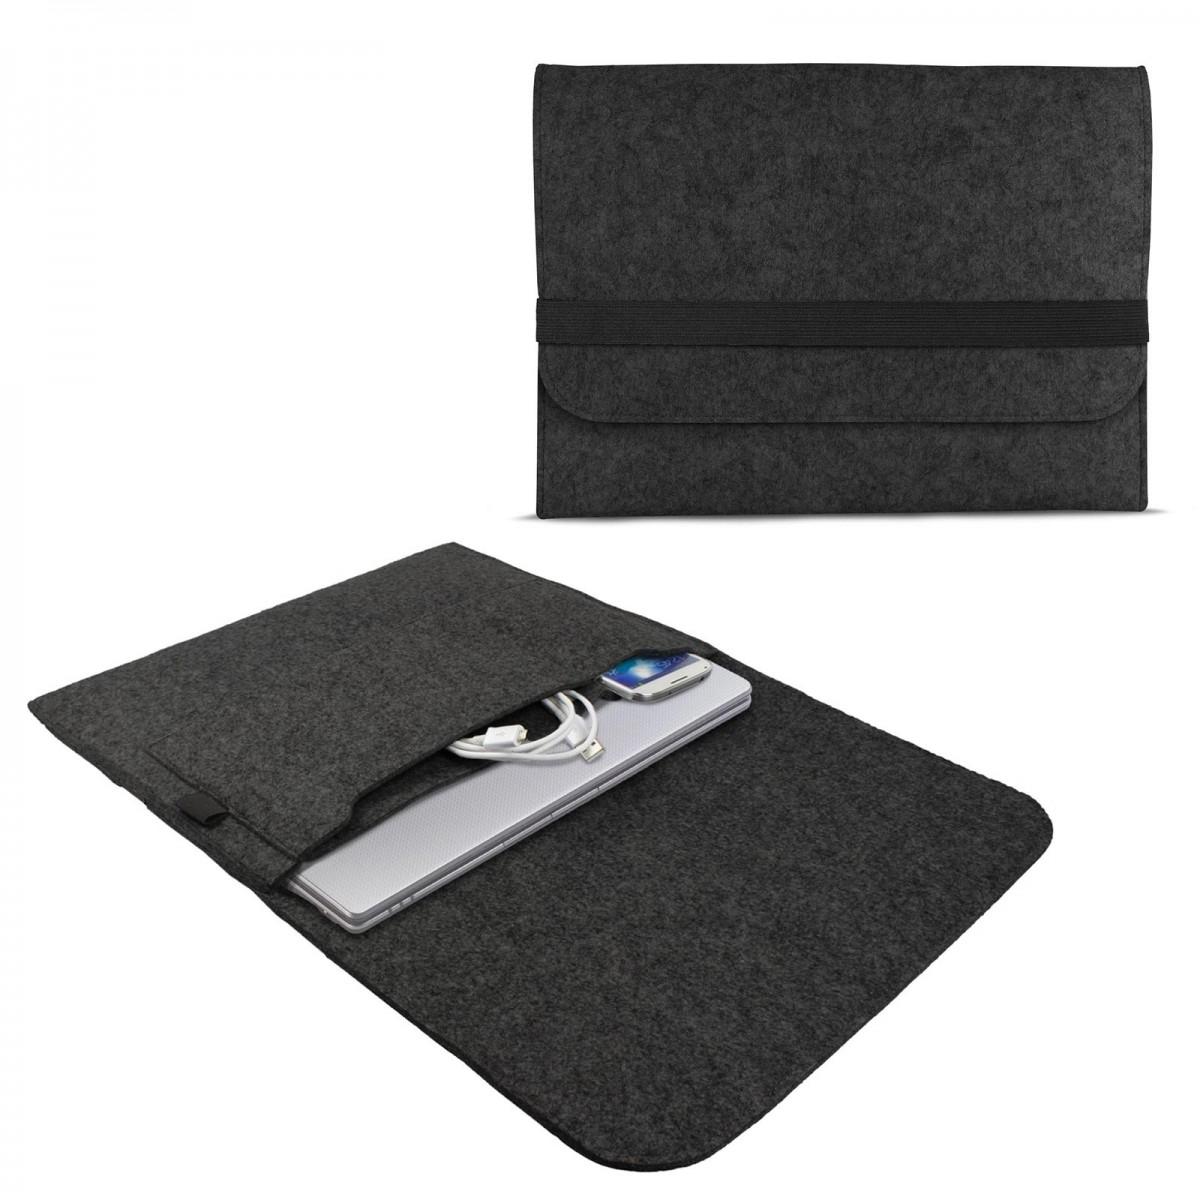 efabrik filz tasche f r microsoft surface laptop. Black Bedroom Furniture Sets. Home Design Ideas